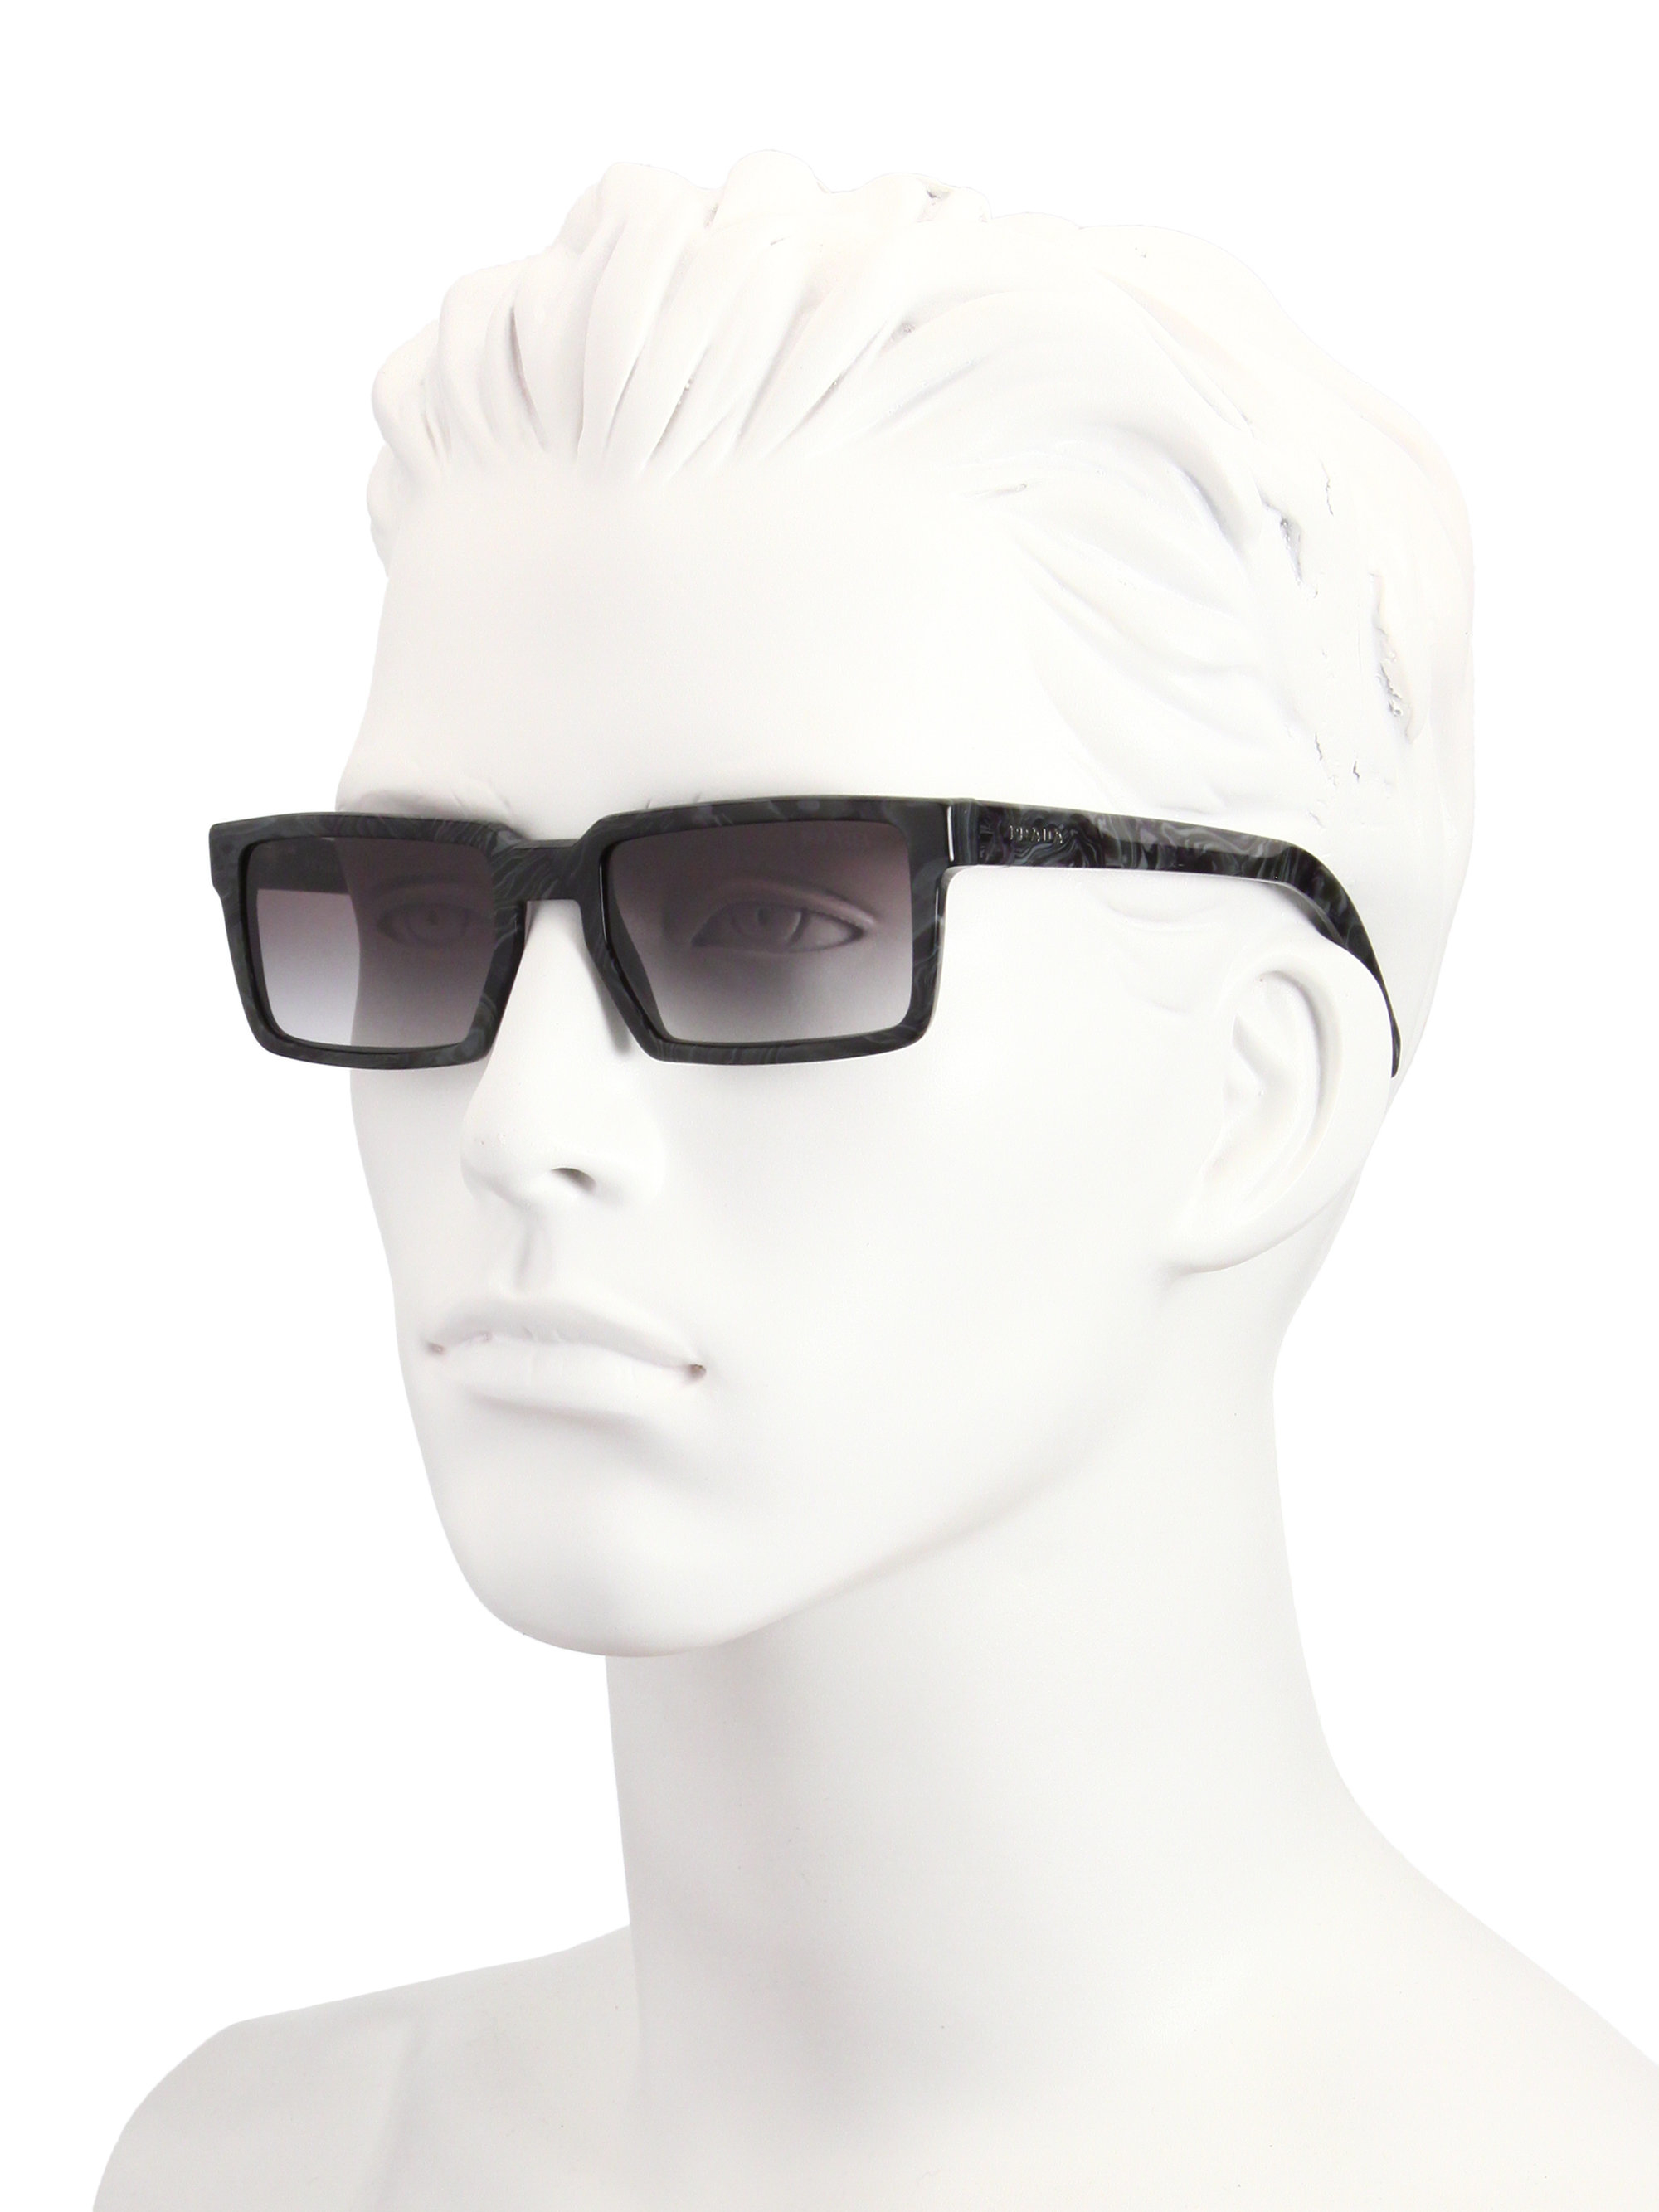 c13ee4dc778b ... reduced lyst prada 54mm rectangle acetate sunglasses in black for men  37b1f 957ac